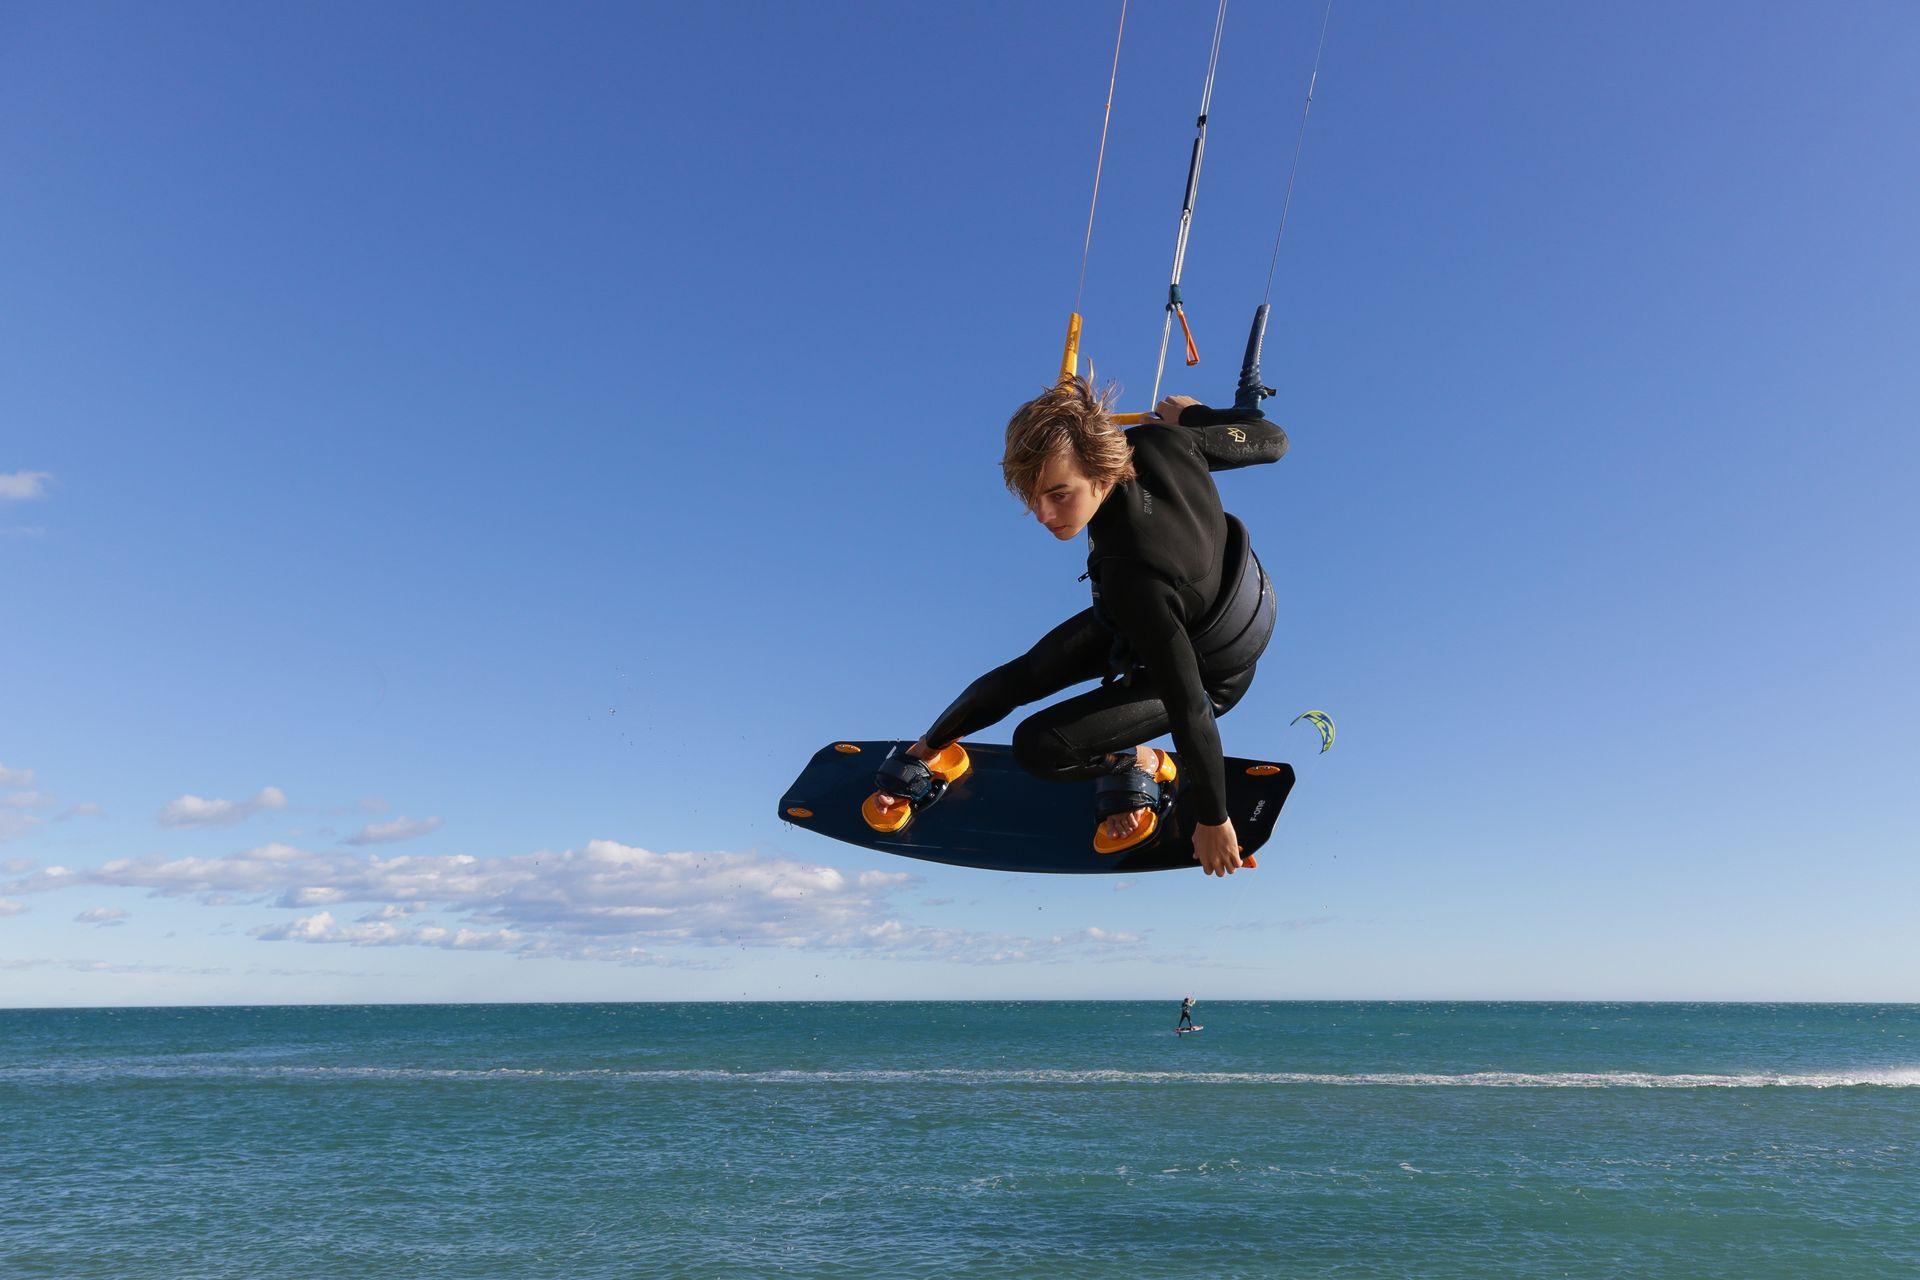 Kitesurfeur en plein saut